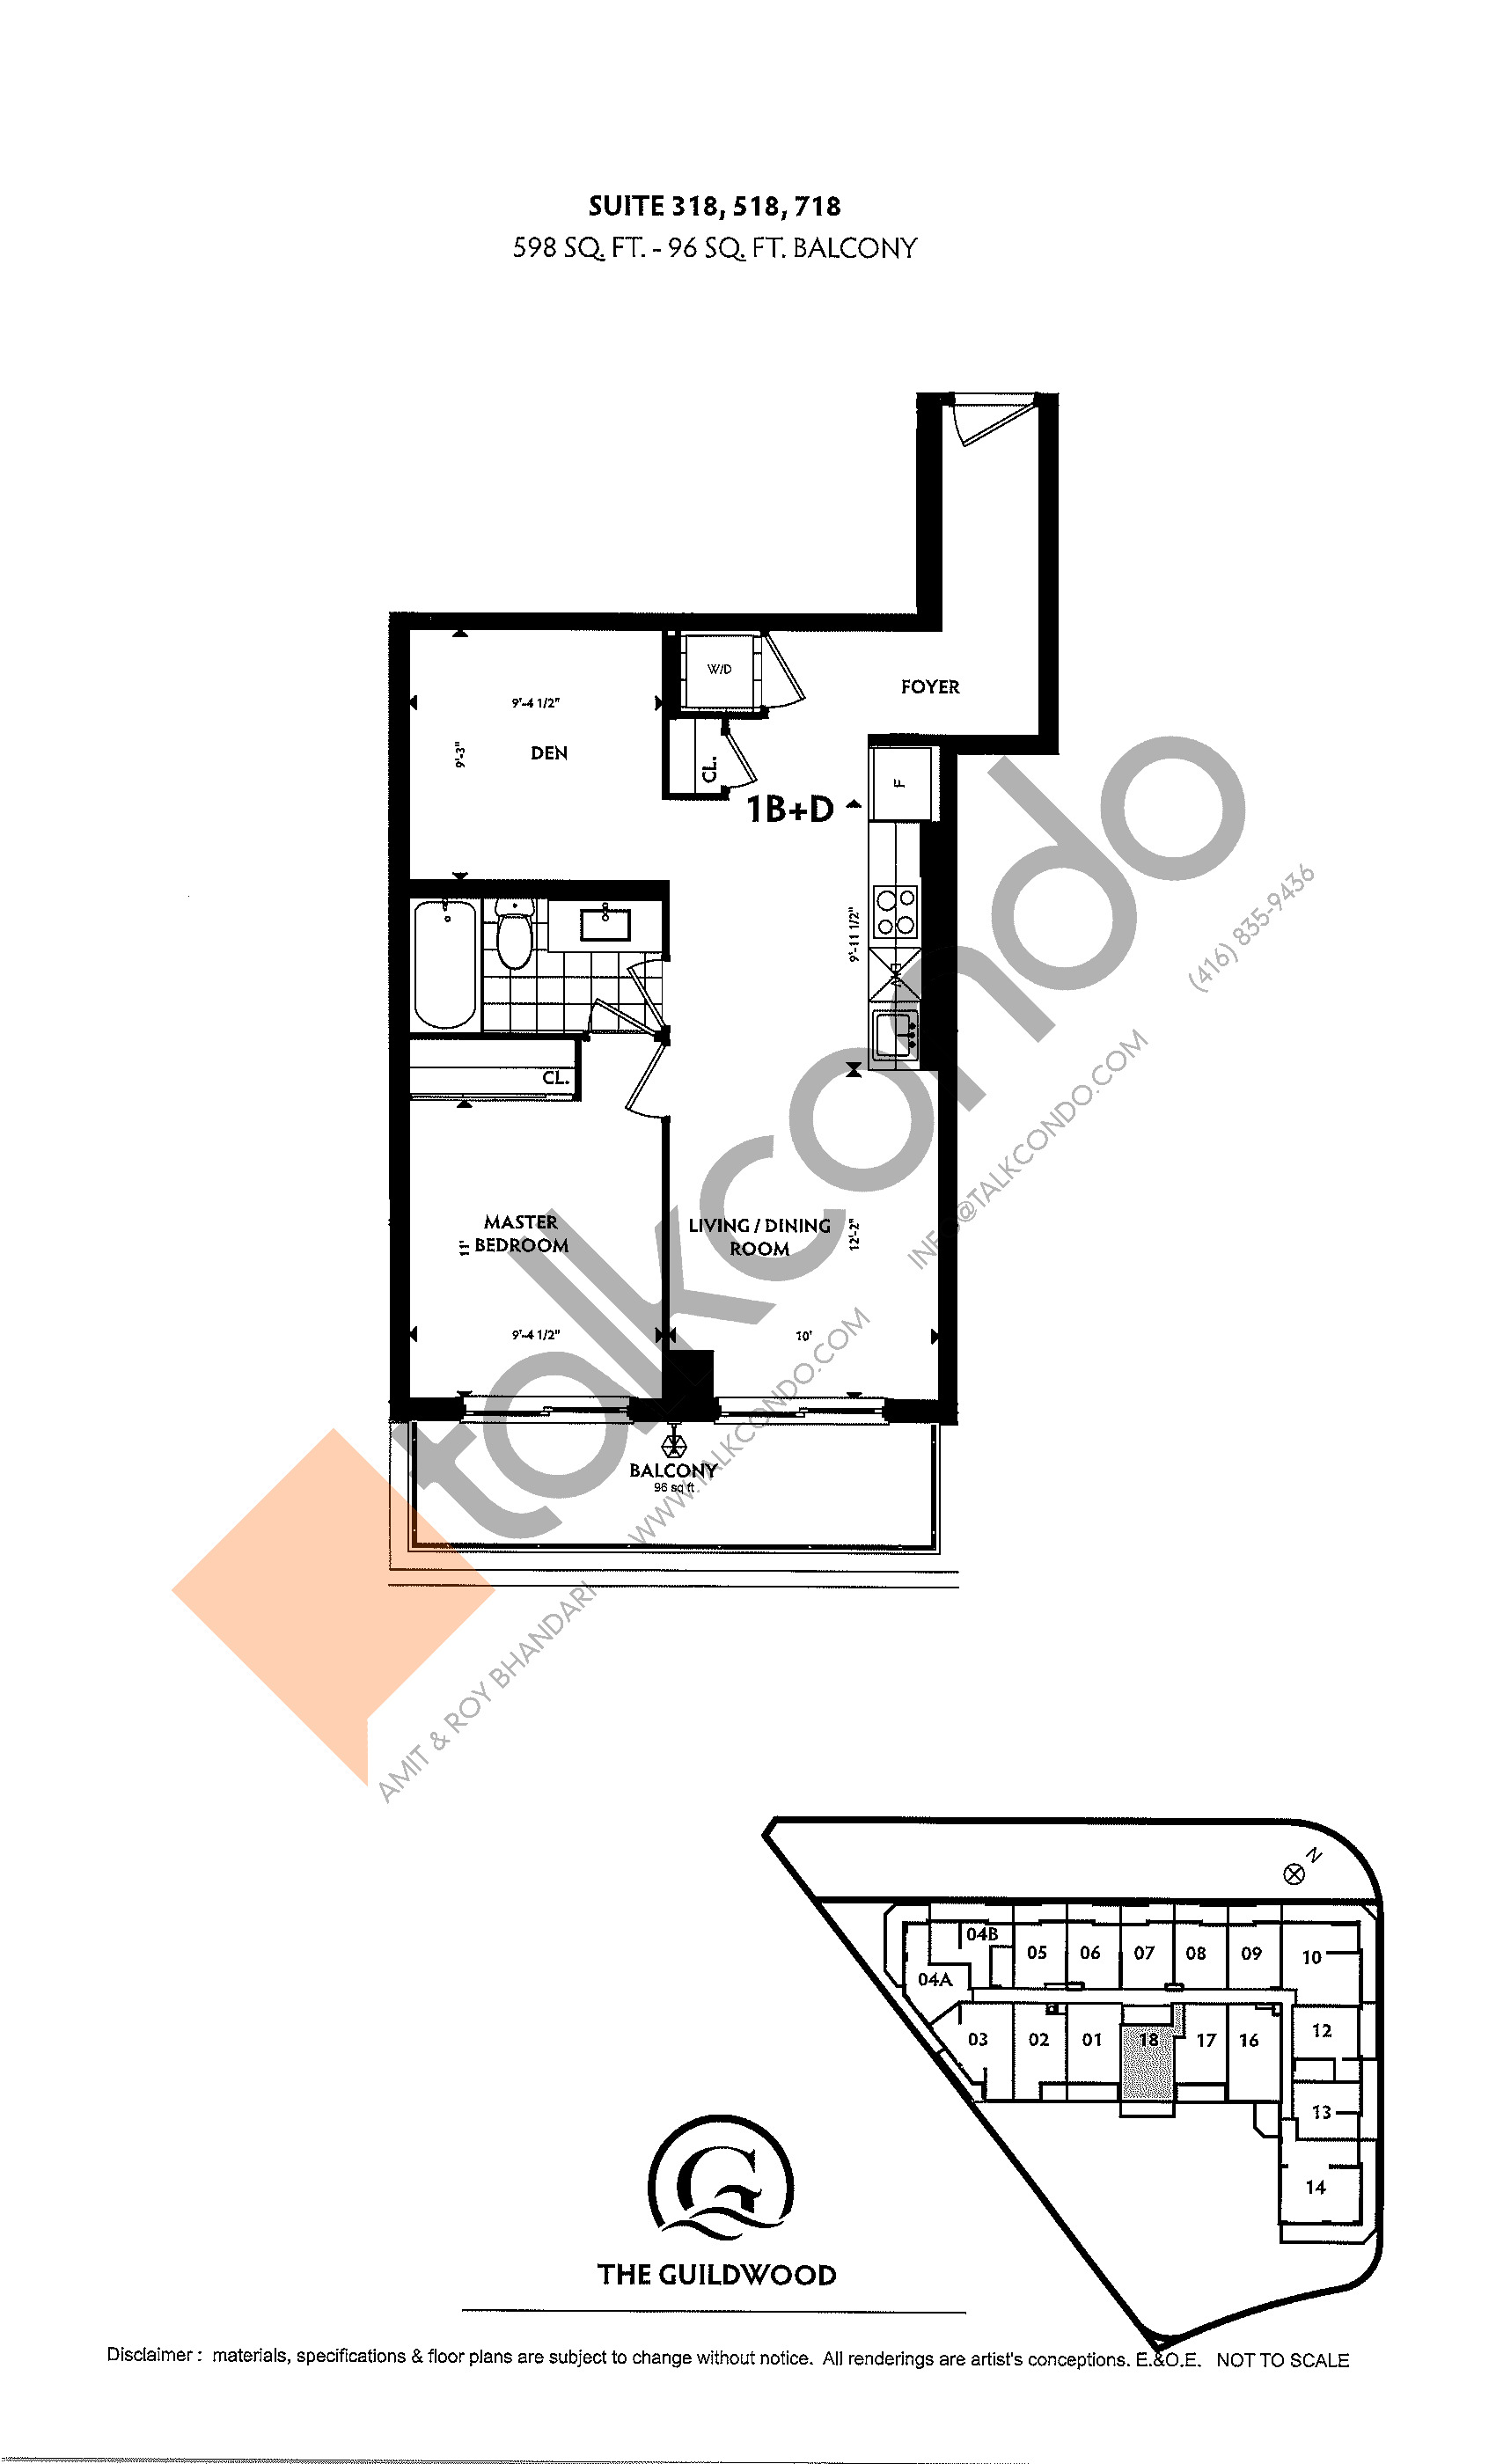 Suite 318, 518, 718 Floor Plan at Guildwood Condos - 598 sq.ft